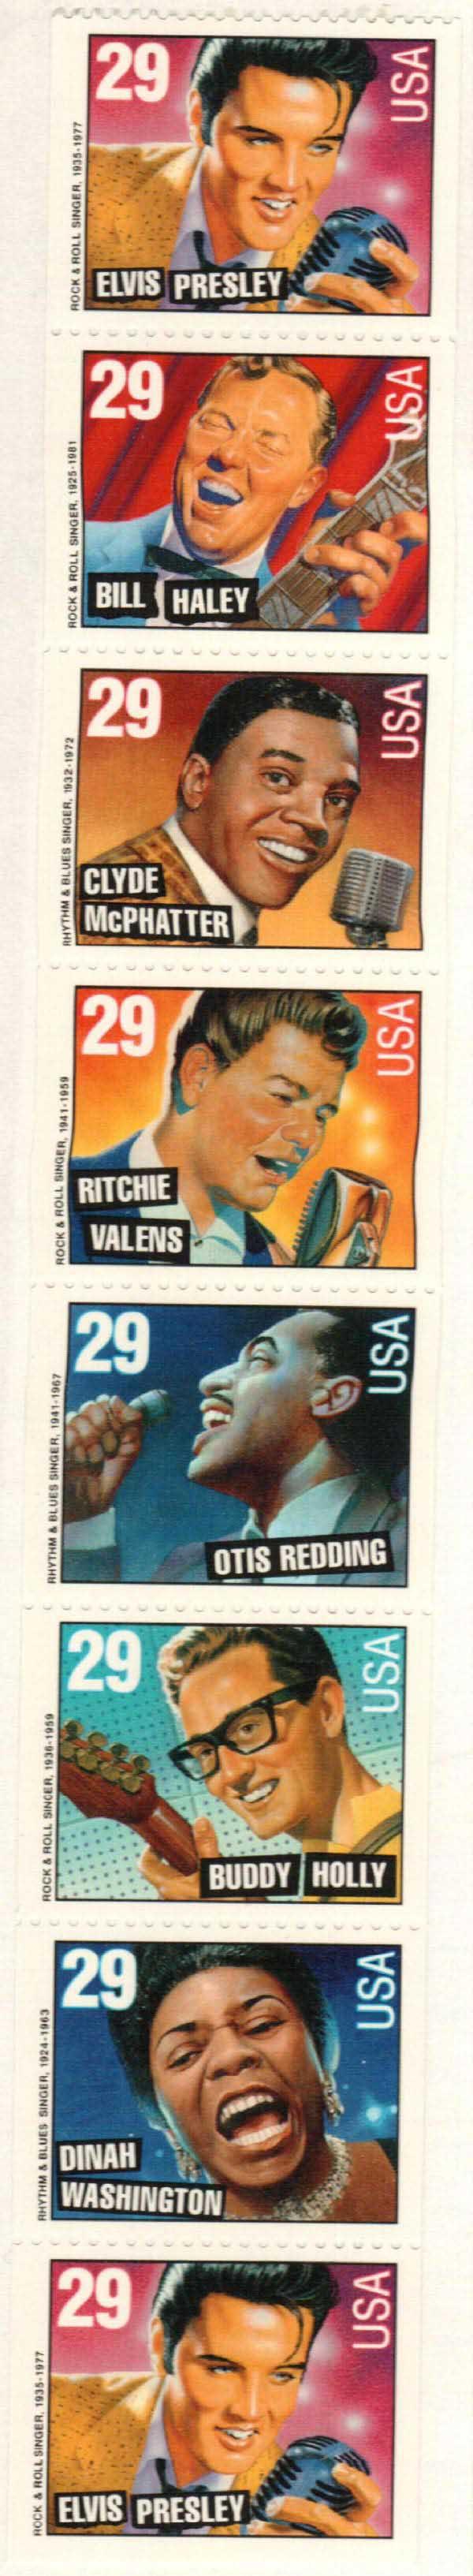 1993 29c Rock & Rhythm,bklt pane of 8